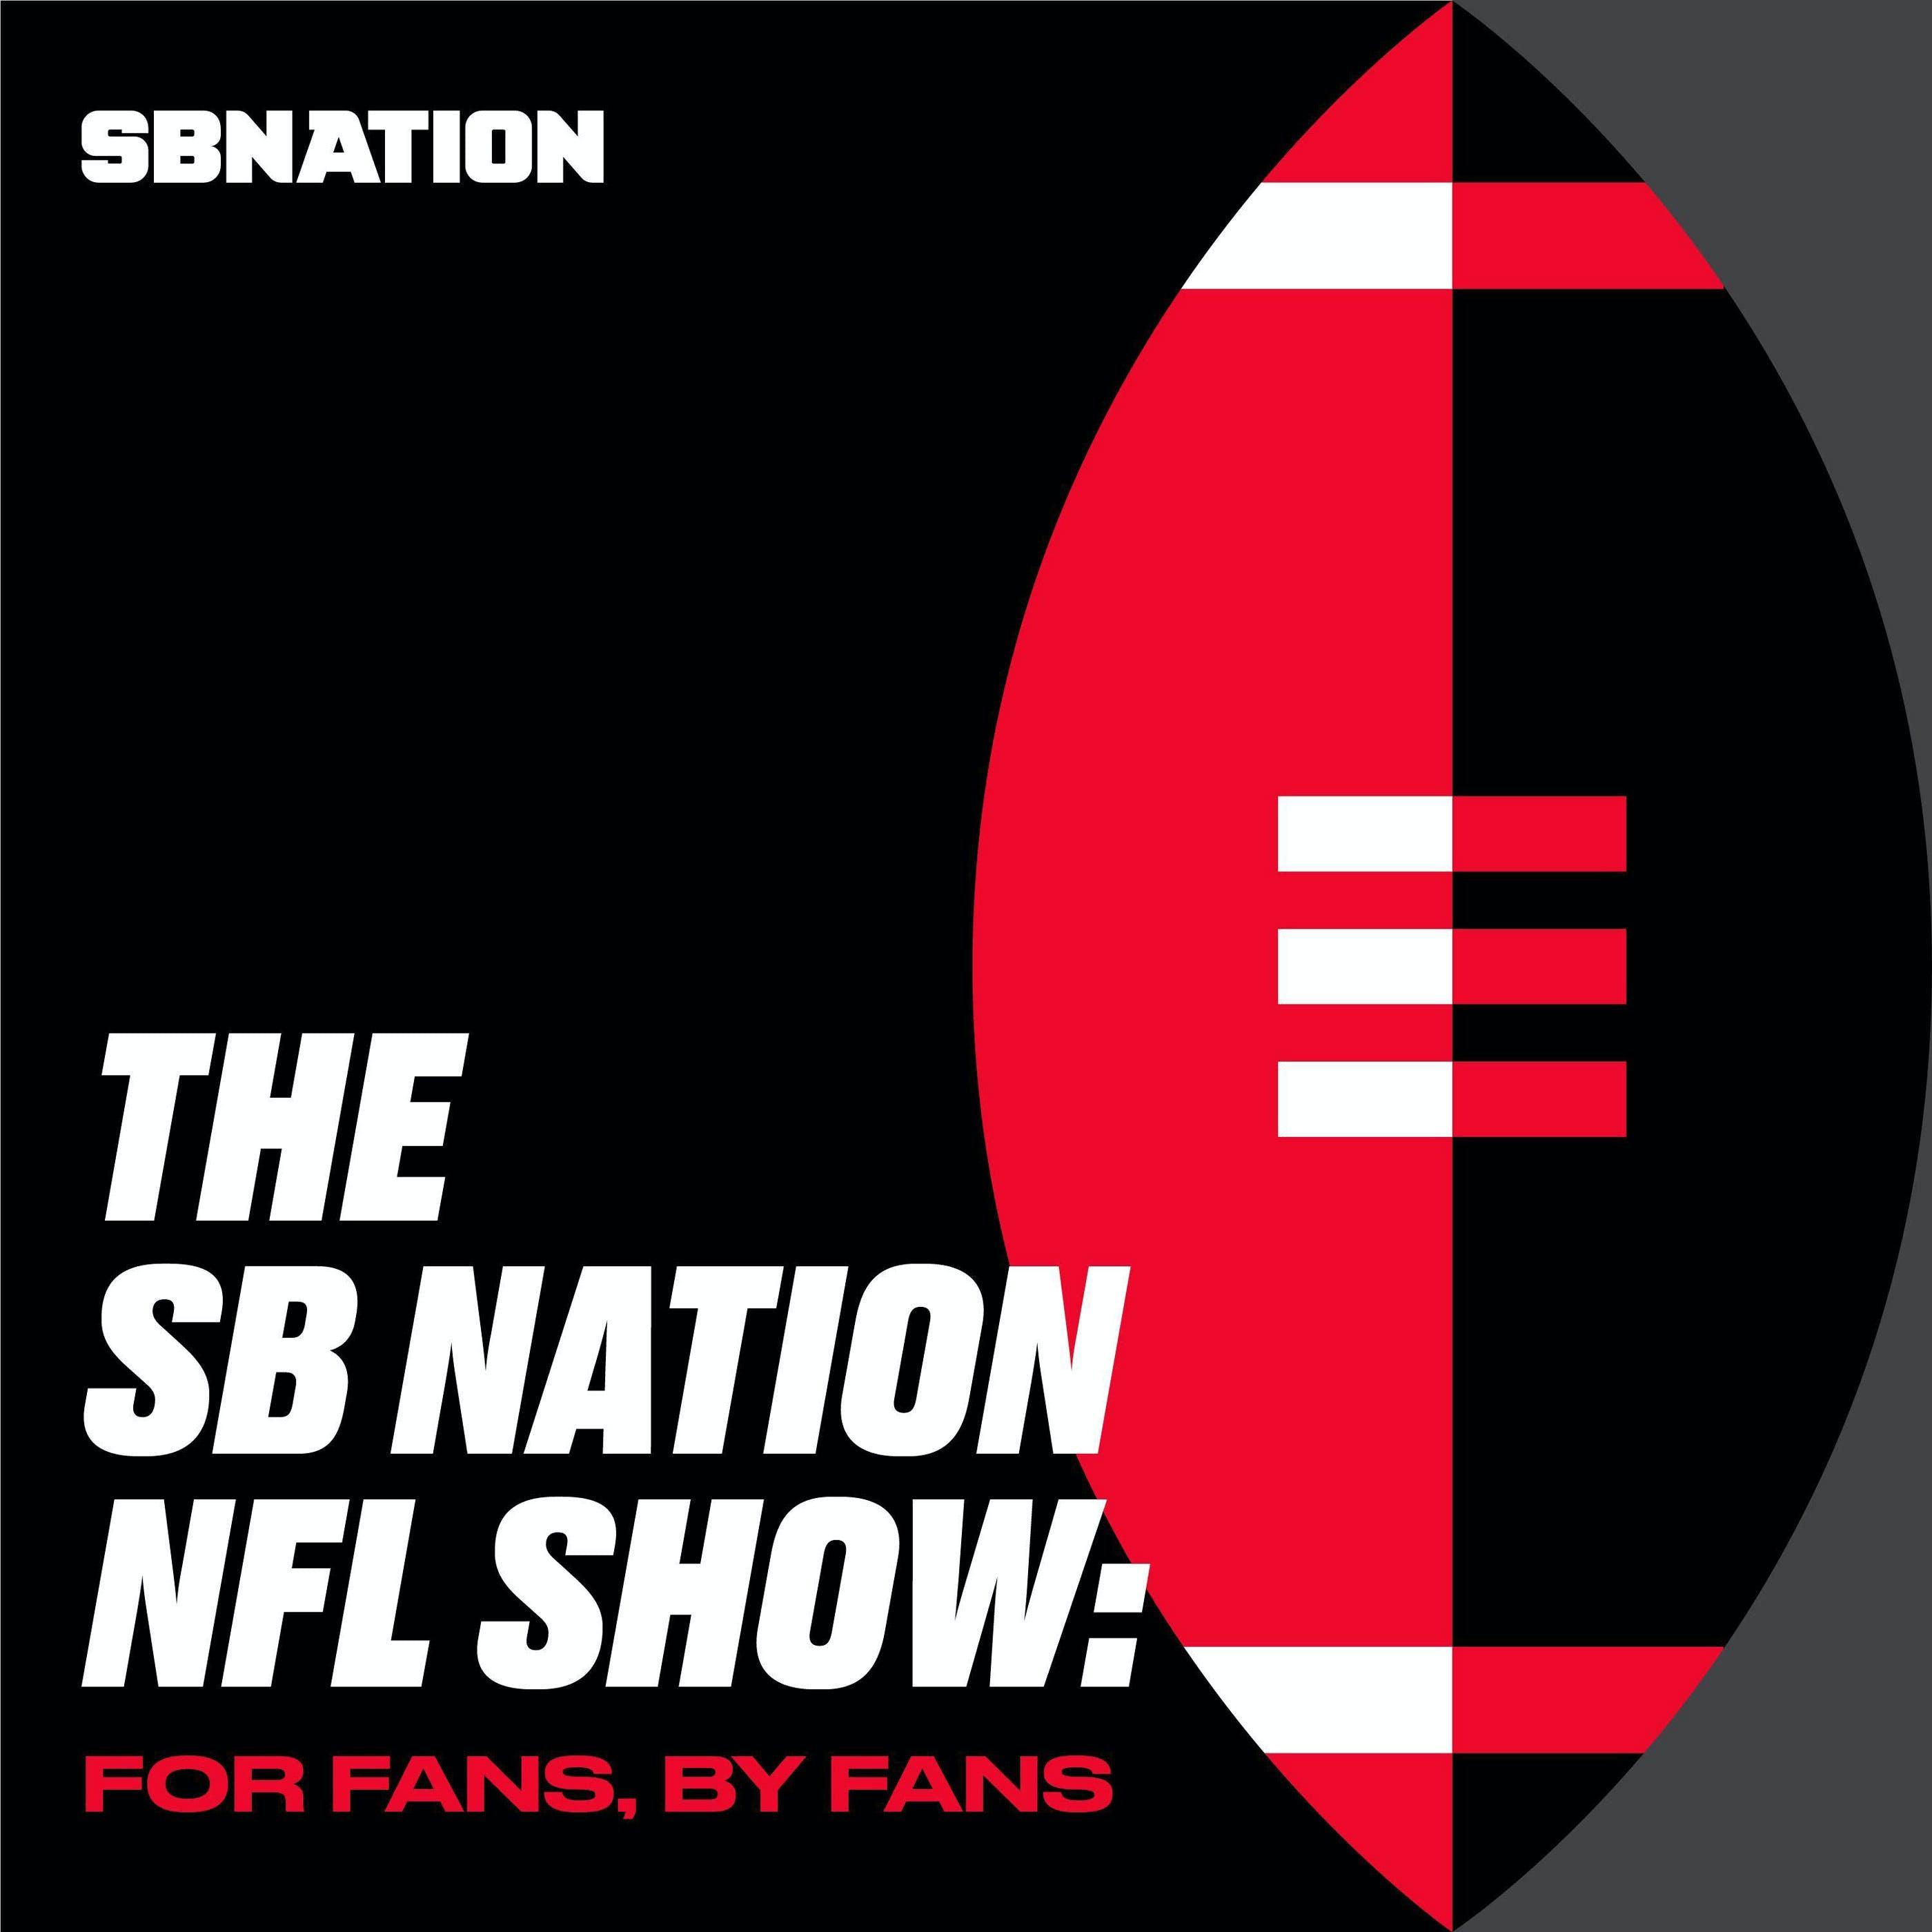 The SB Nation NFL Show